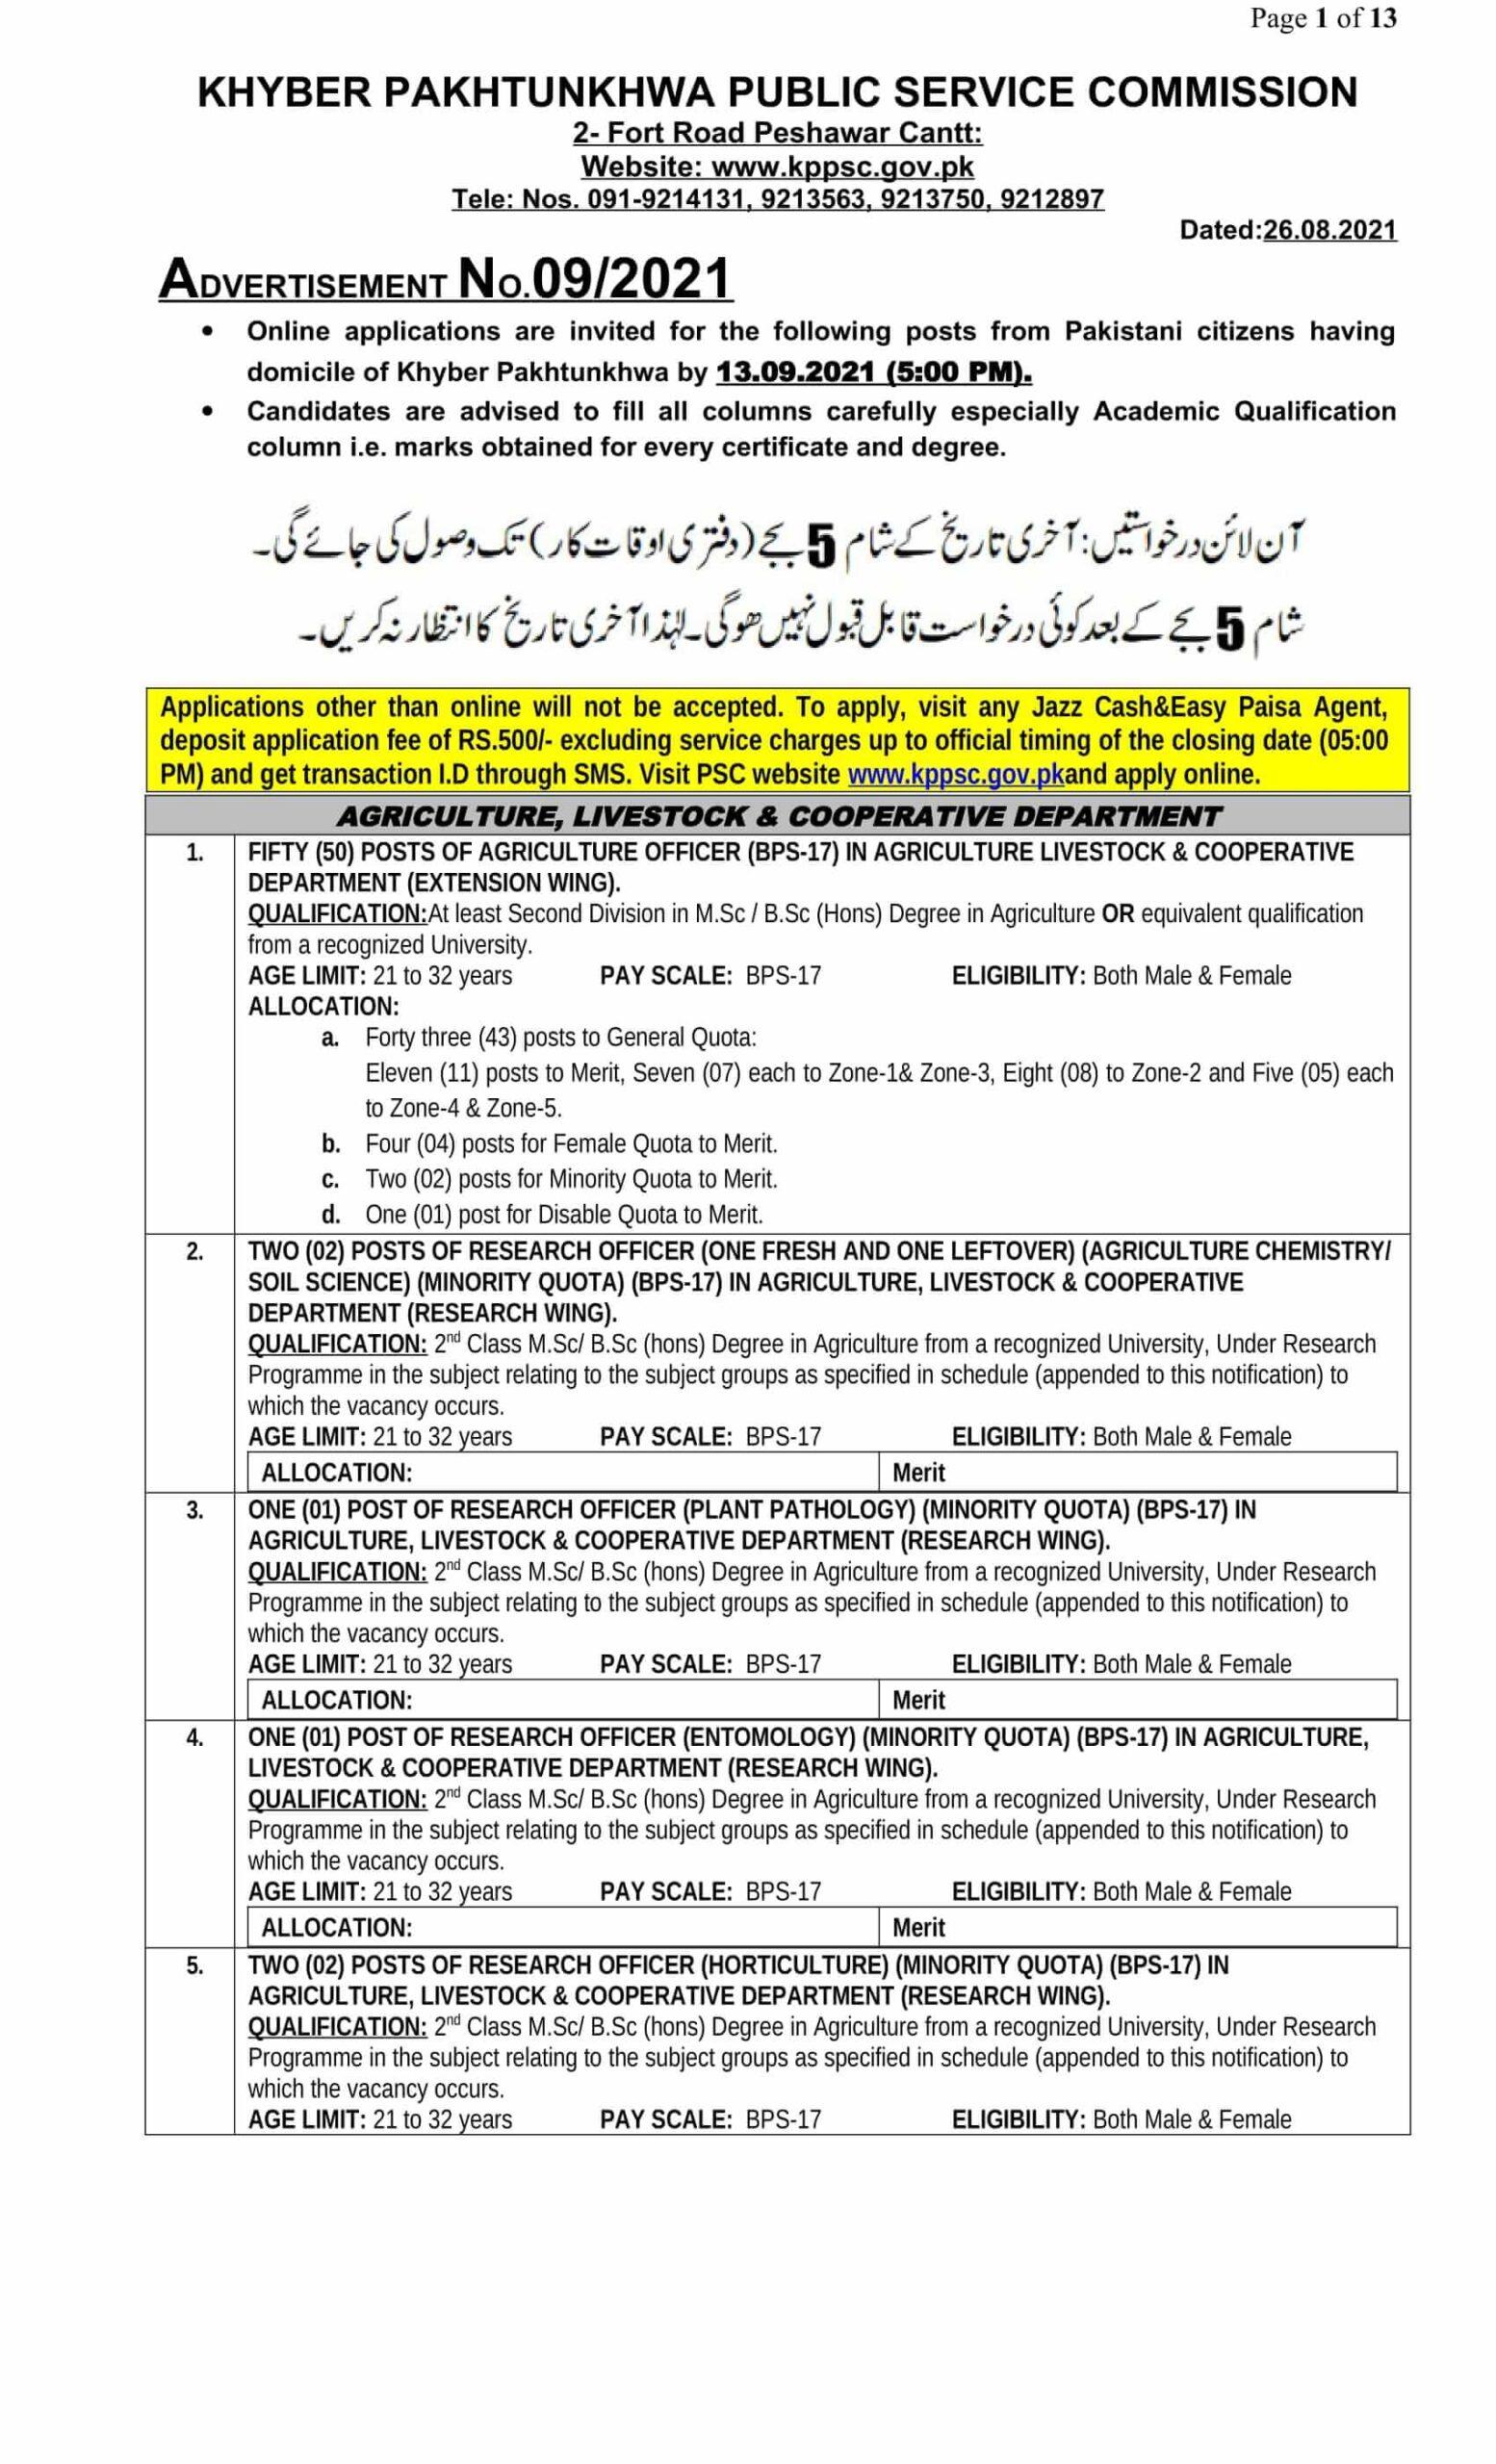 KPPSC Latest Jobs 2021 KPK Khyber Pakhtunkhwa Public Service Commission September 2021